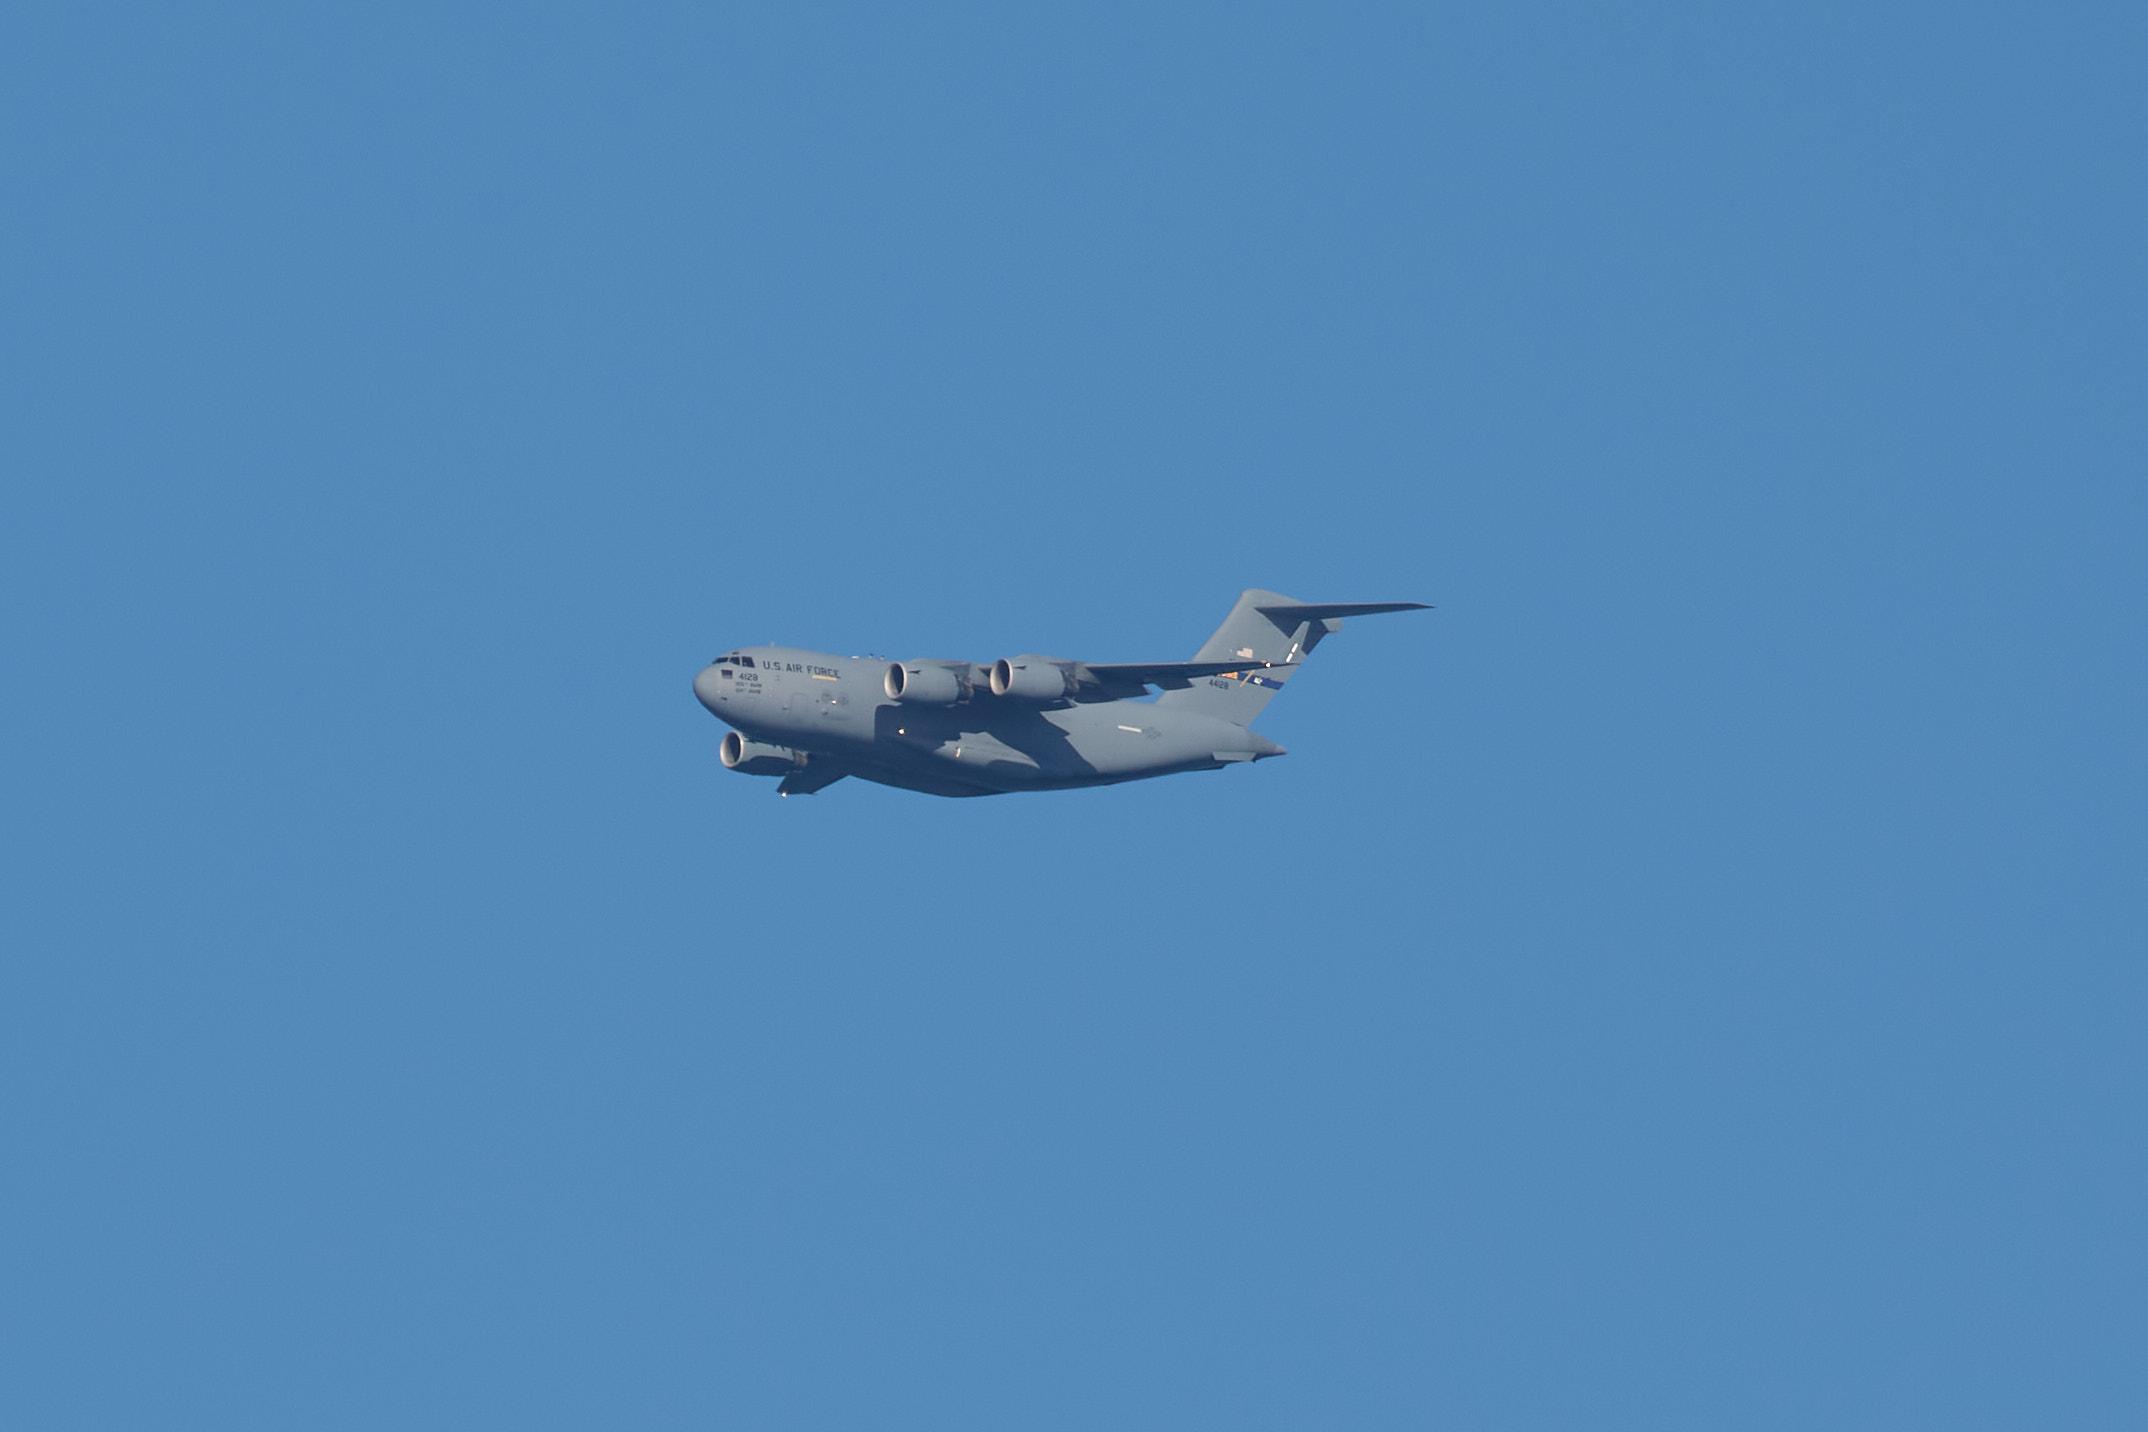 C-5A Galaxy transport plane.